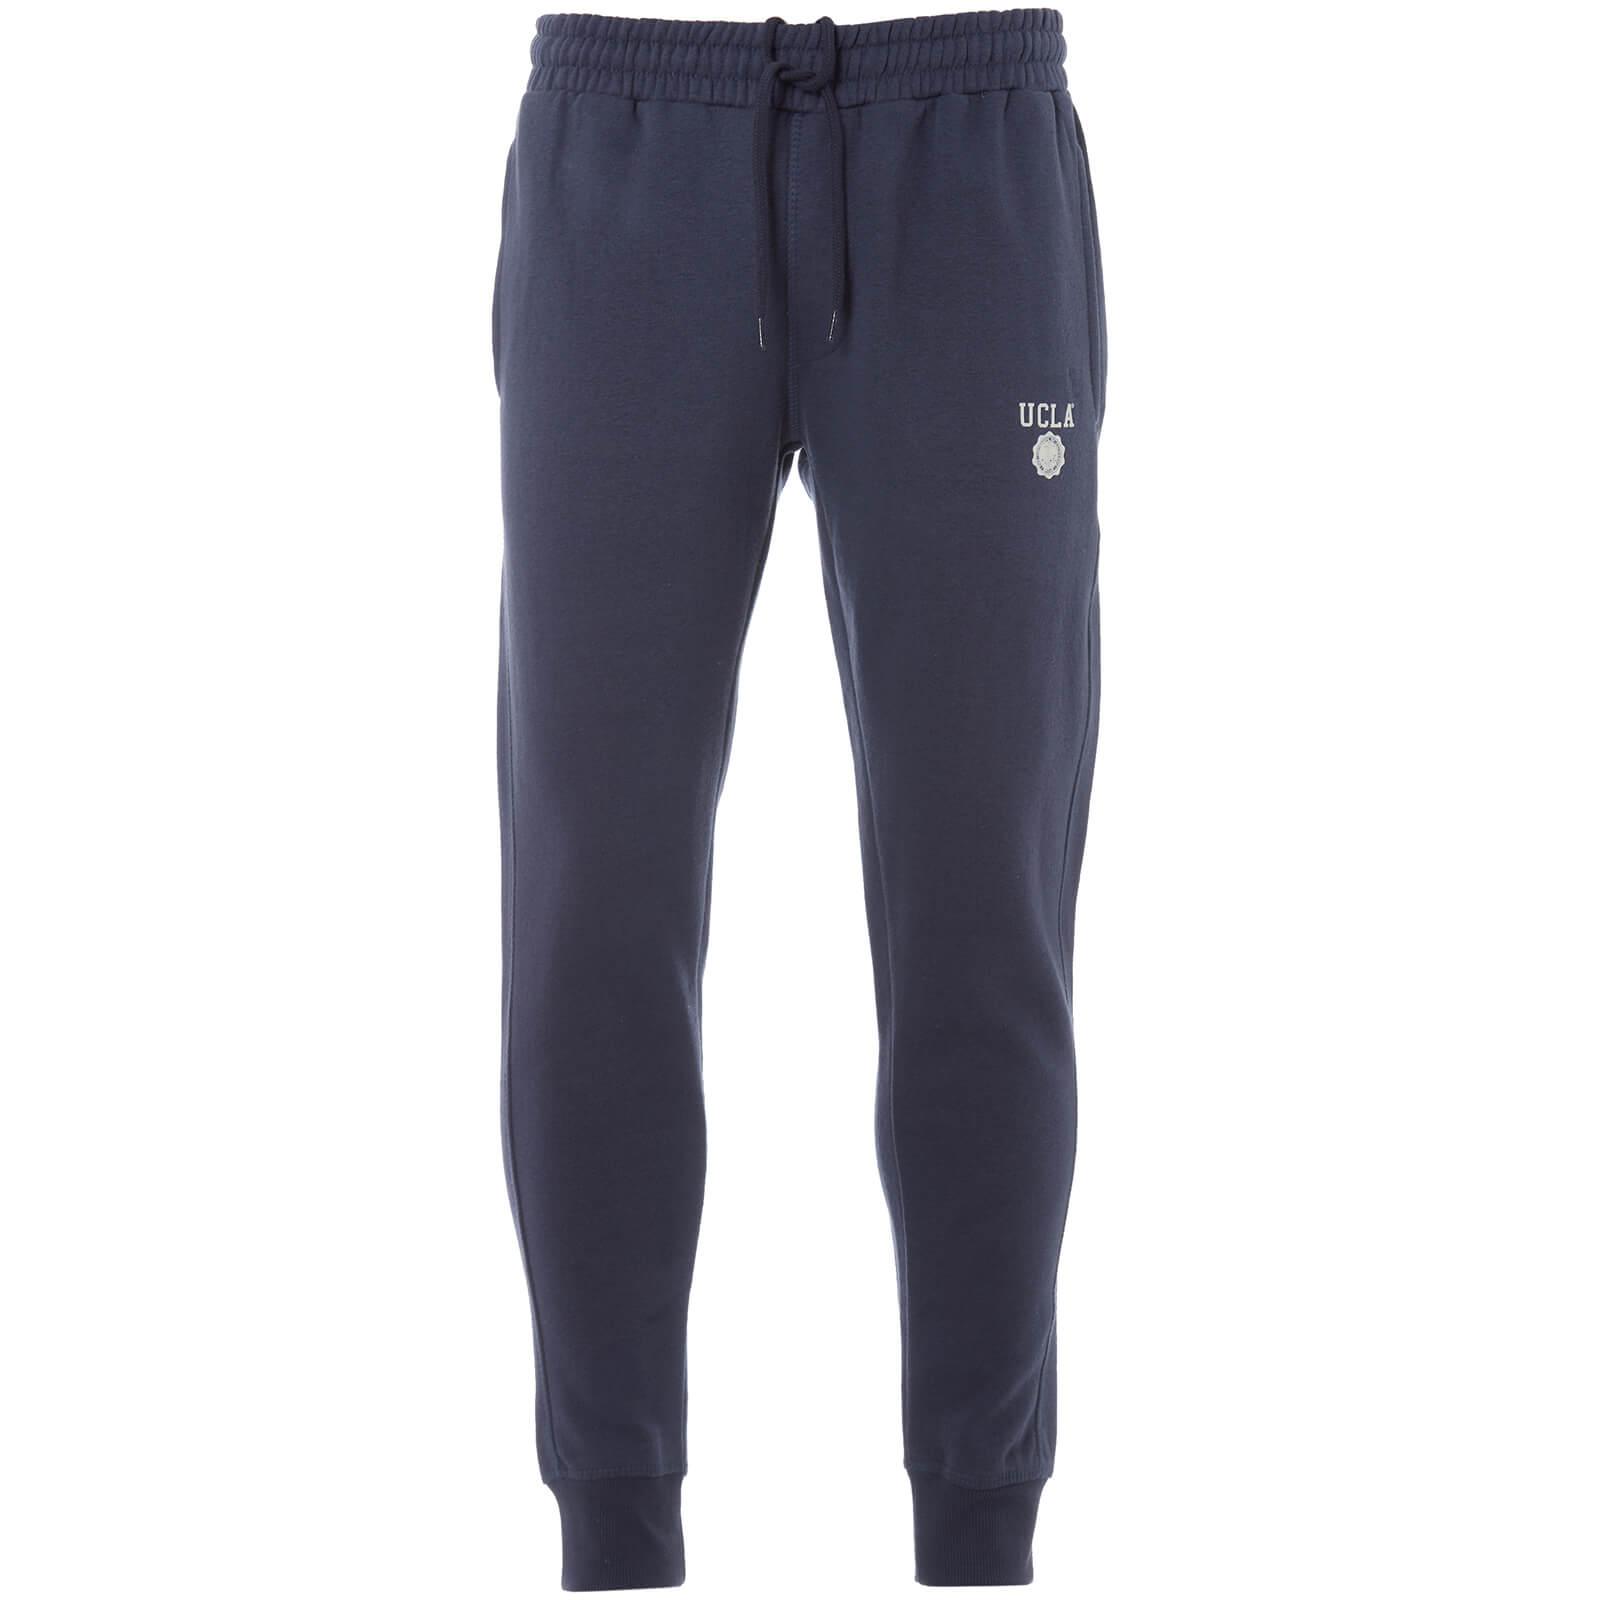 UCLA Men's Peterson Logo Sweatpants - Navy Clothing | Zavvi US